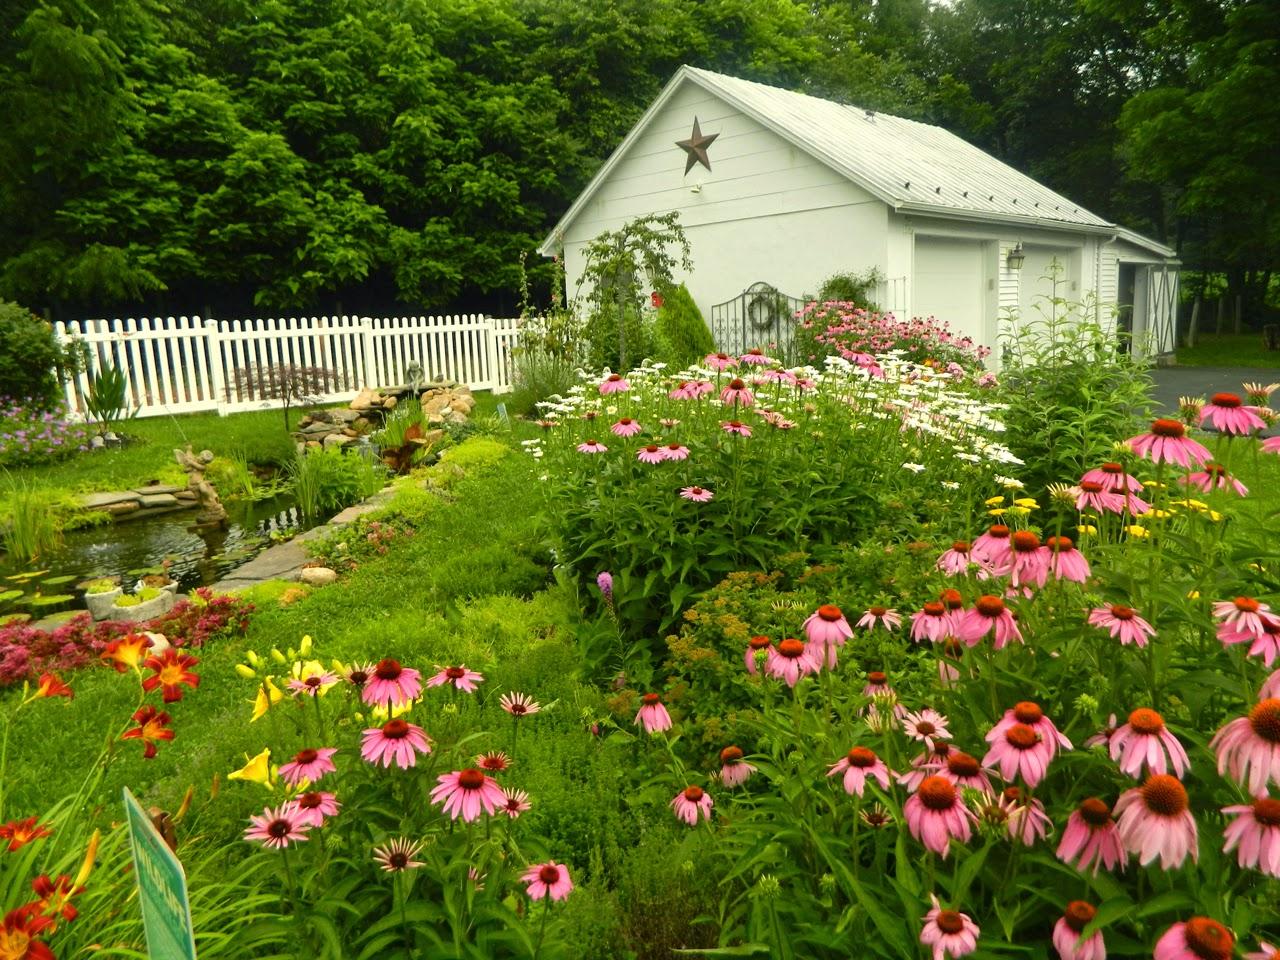 Pams English Cottage Garden